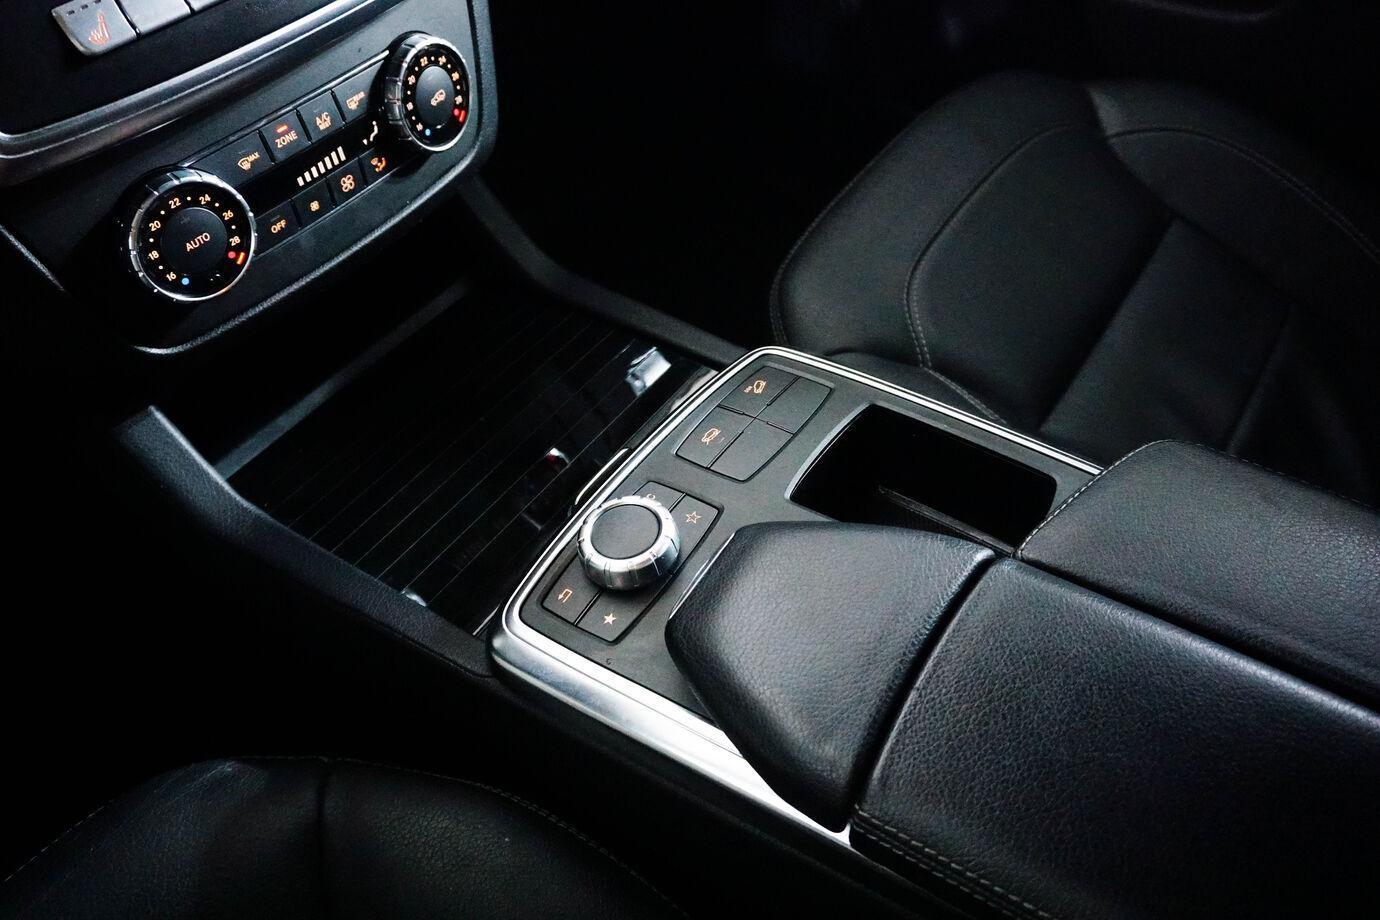 Mercedes-Benz M-Класс, III (W166) 2014г.